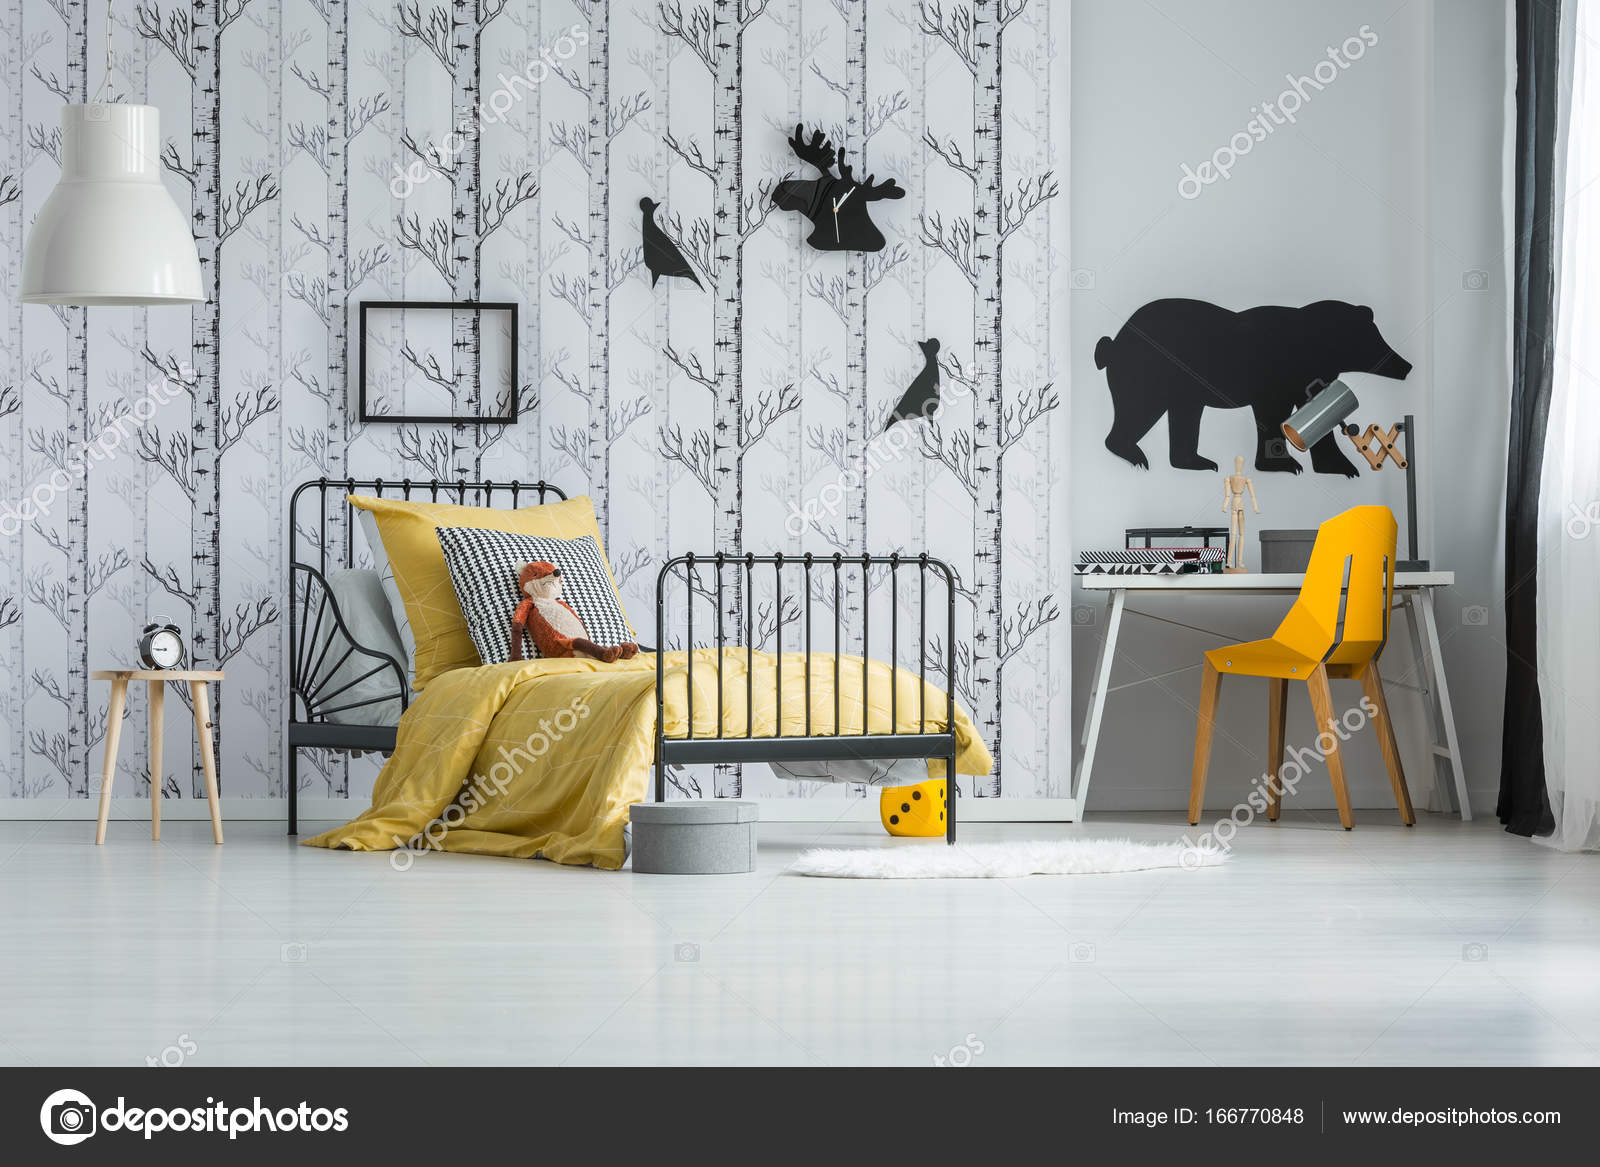 Pluschtier Auf Kinder Bett Stockfoto C Photographee Eu 166770848